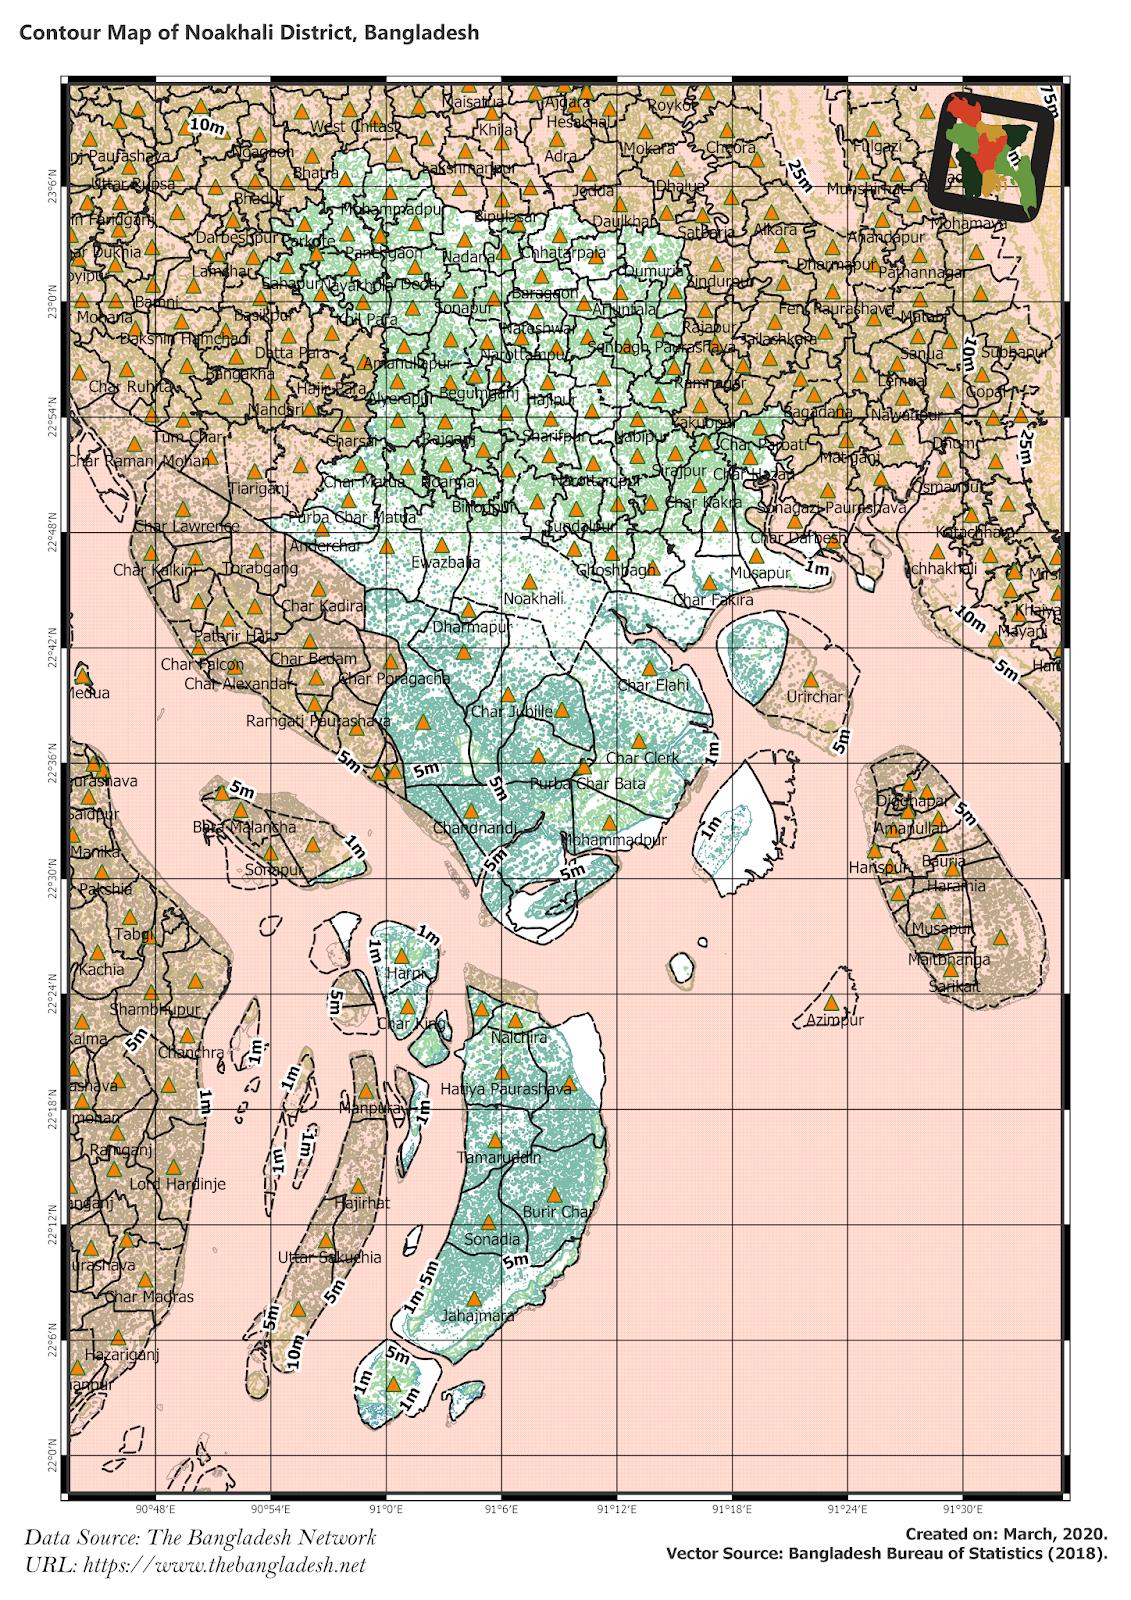 Elevation Map of Noakhali District of Bangladesh